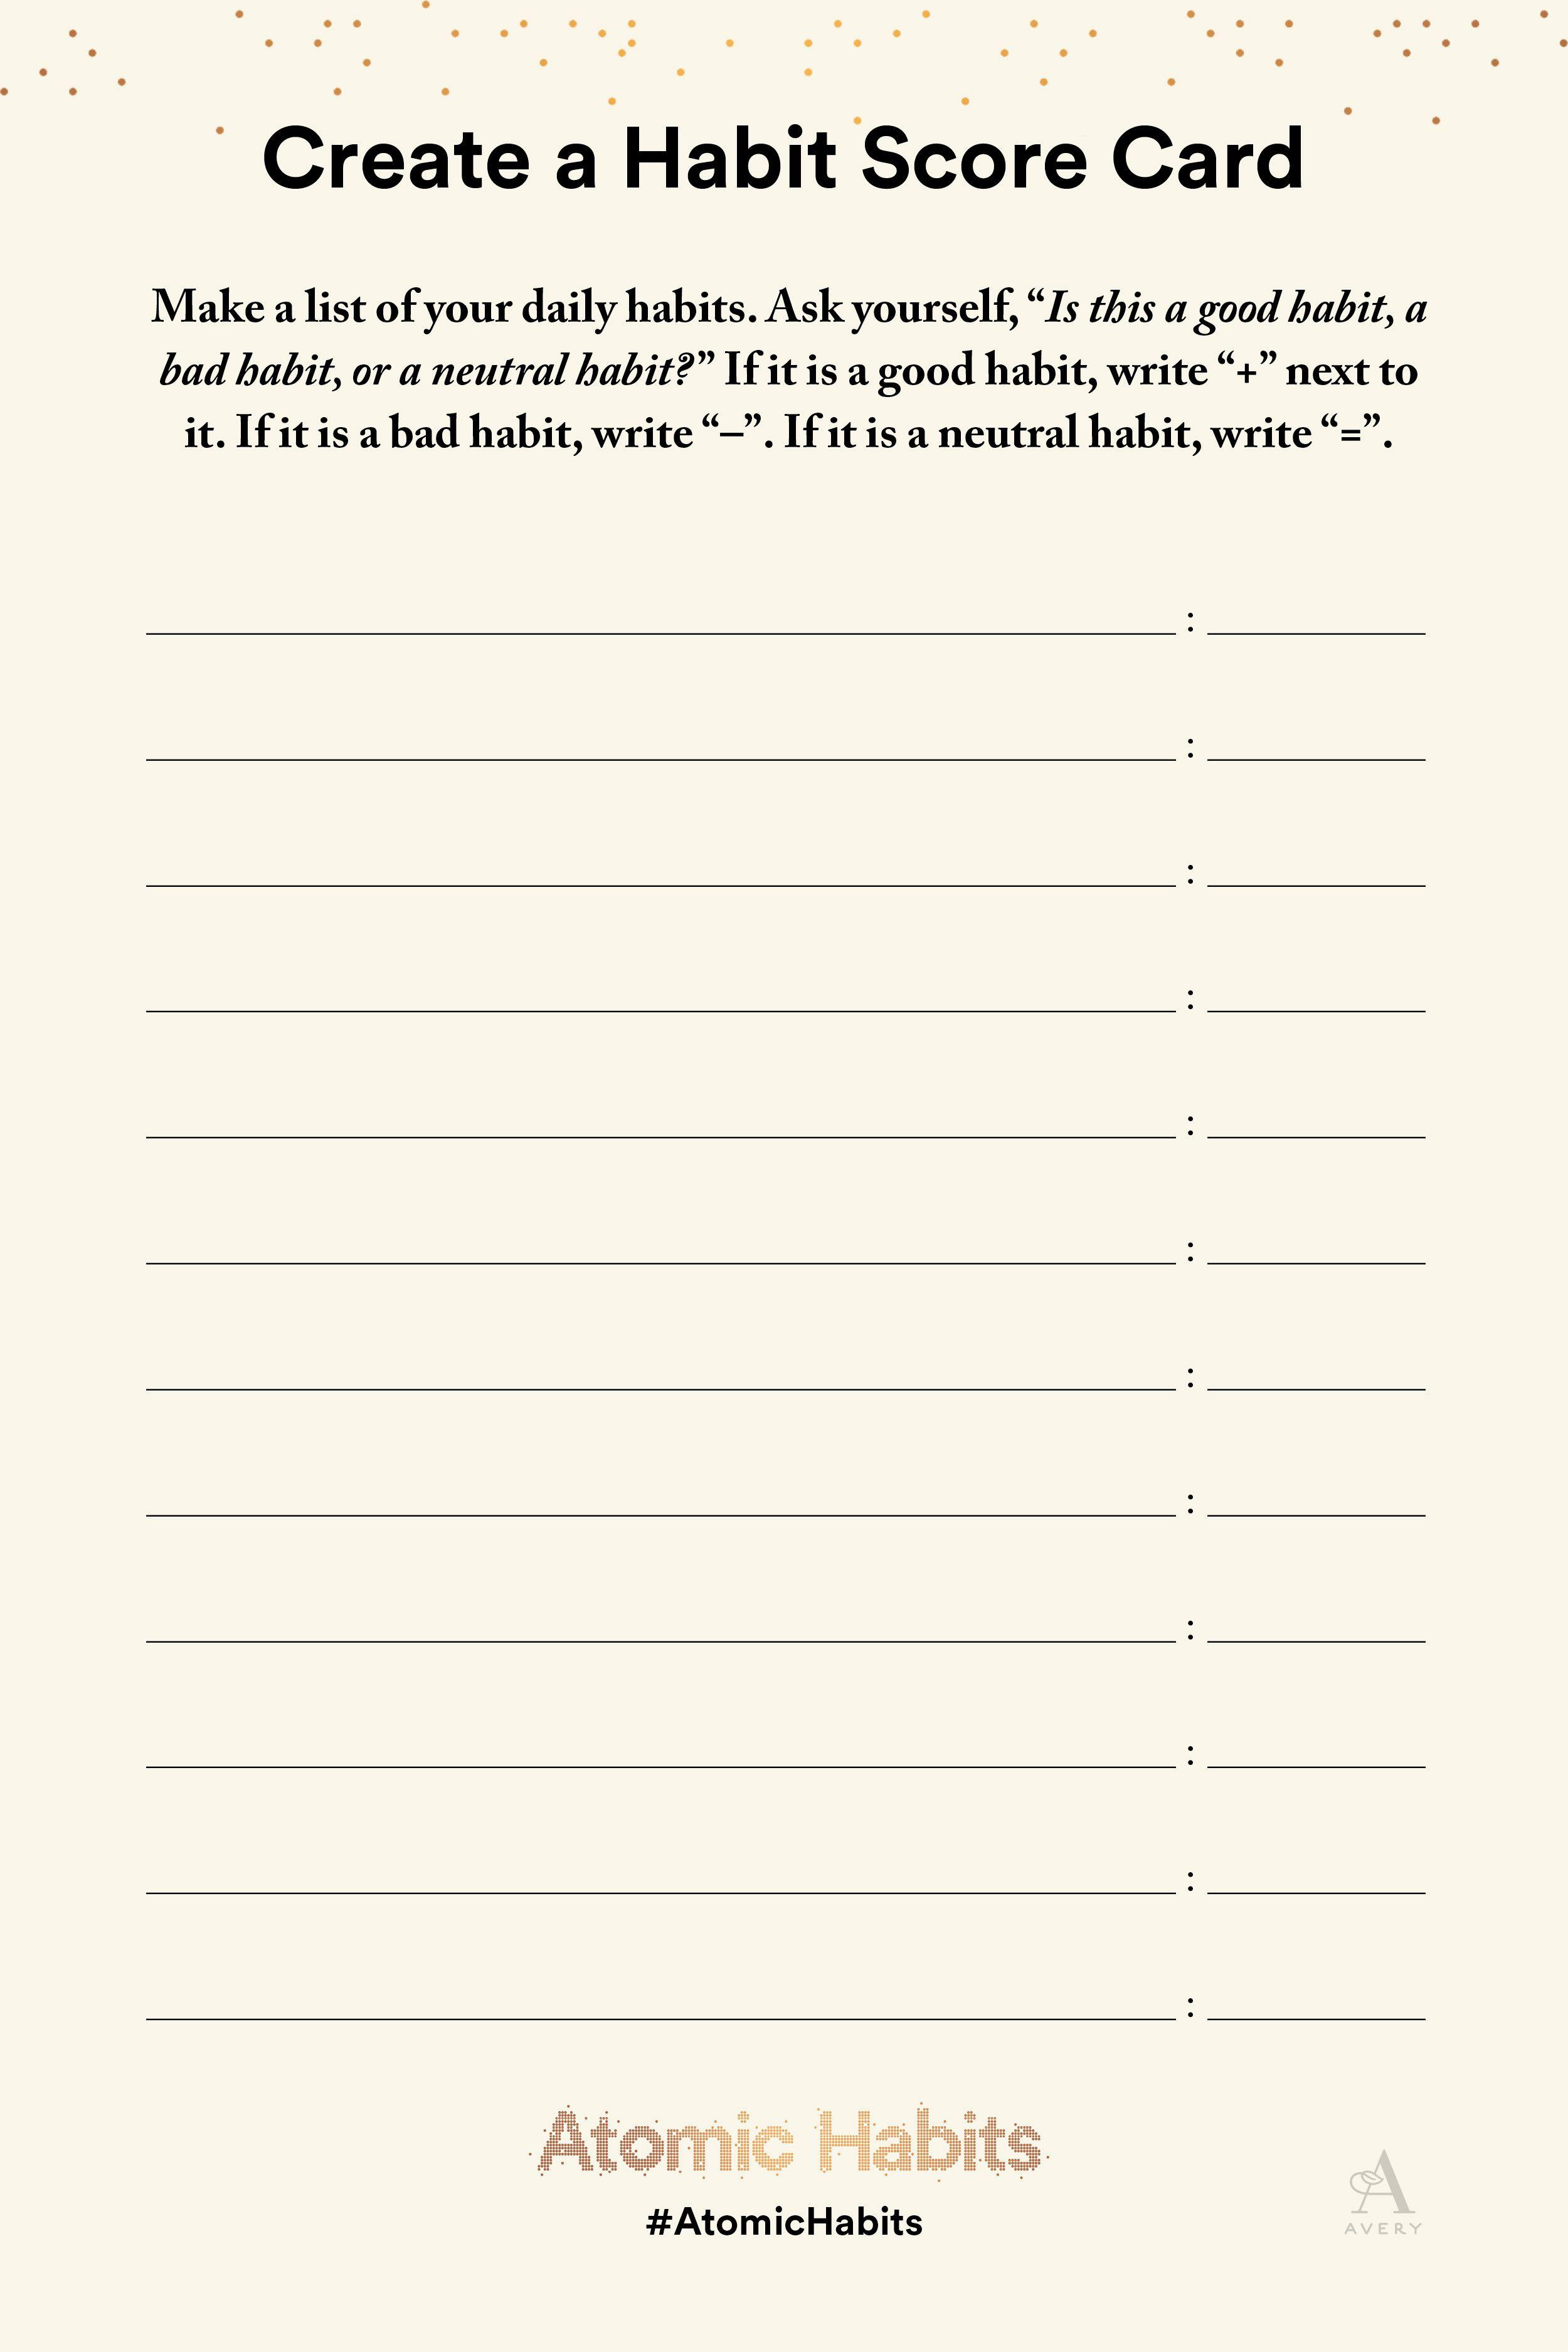 Atomic Habits By James Clear 9780735211292 Penguinrandomhouse Com Books Habit Quotes Good Habits Journal Writing Prompts